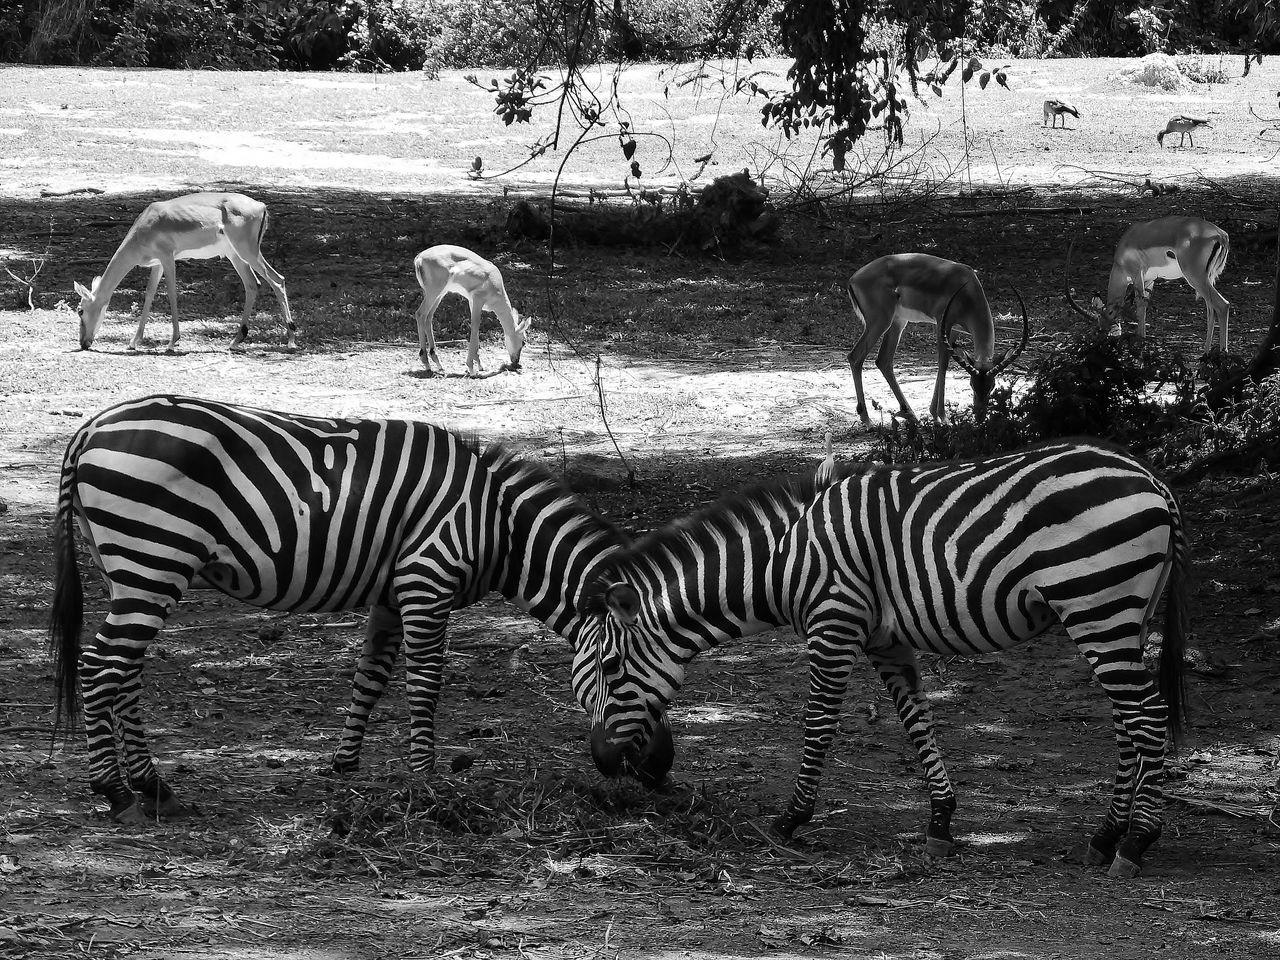 group of animals, animal themes, zebra, animals in the wild, animal, striped, mammal, animal wildlife, vertebrate, field, land, nature, plant, tree, large group of animals, safari, no people, domestic animals, day, herbivorous, herd, outdoors, zoo, drinking